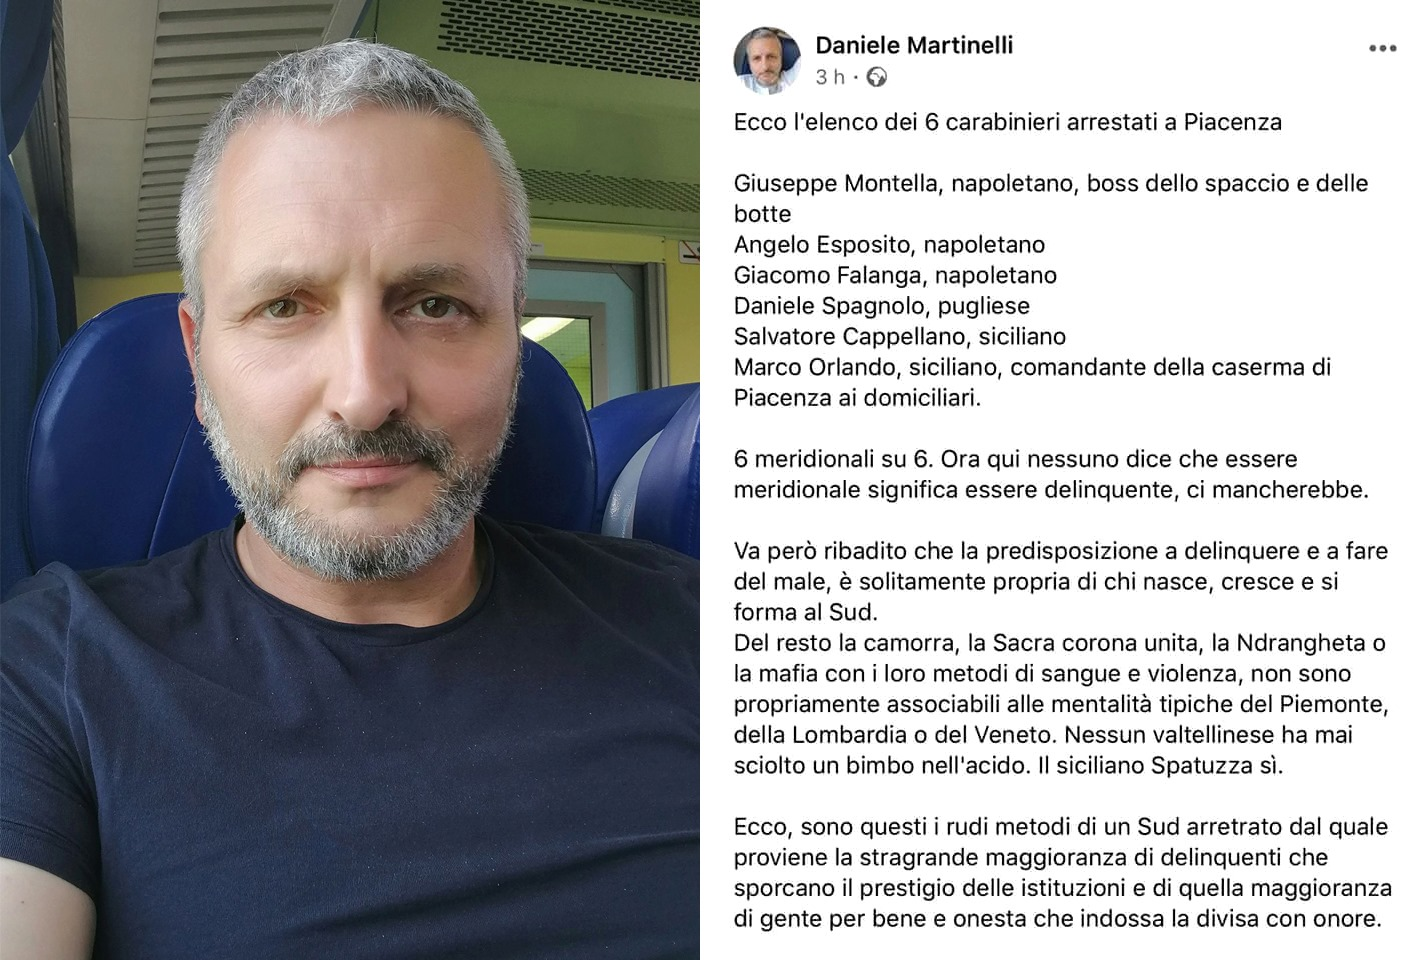 daniele_martinelli_carabinieri_piacenza